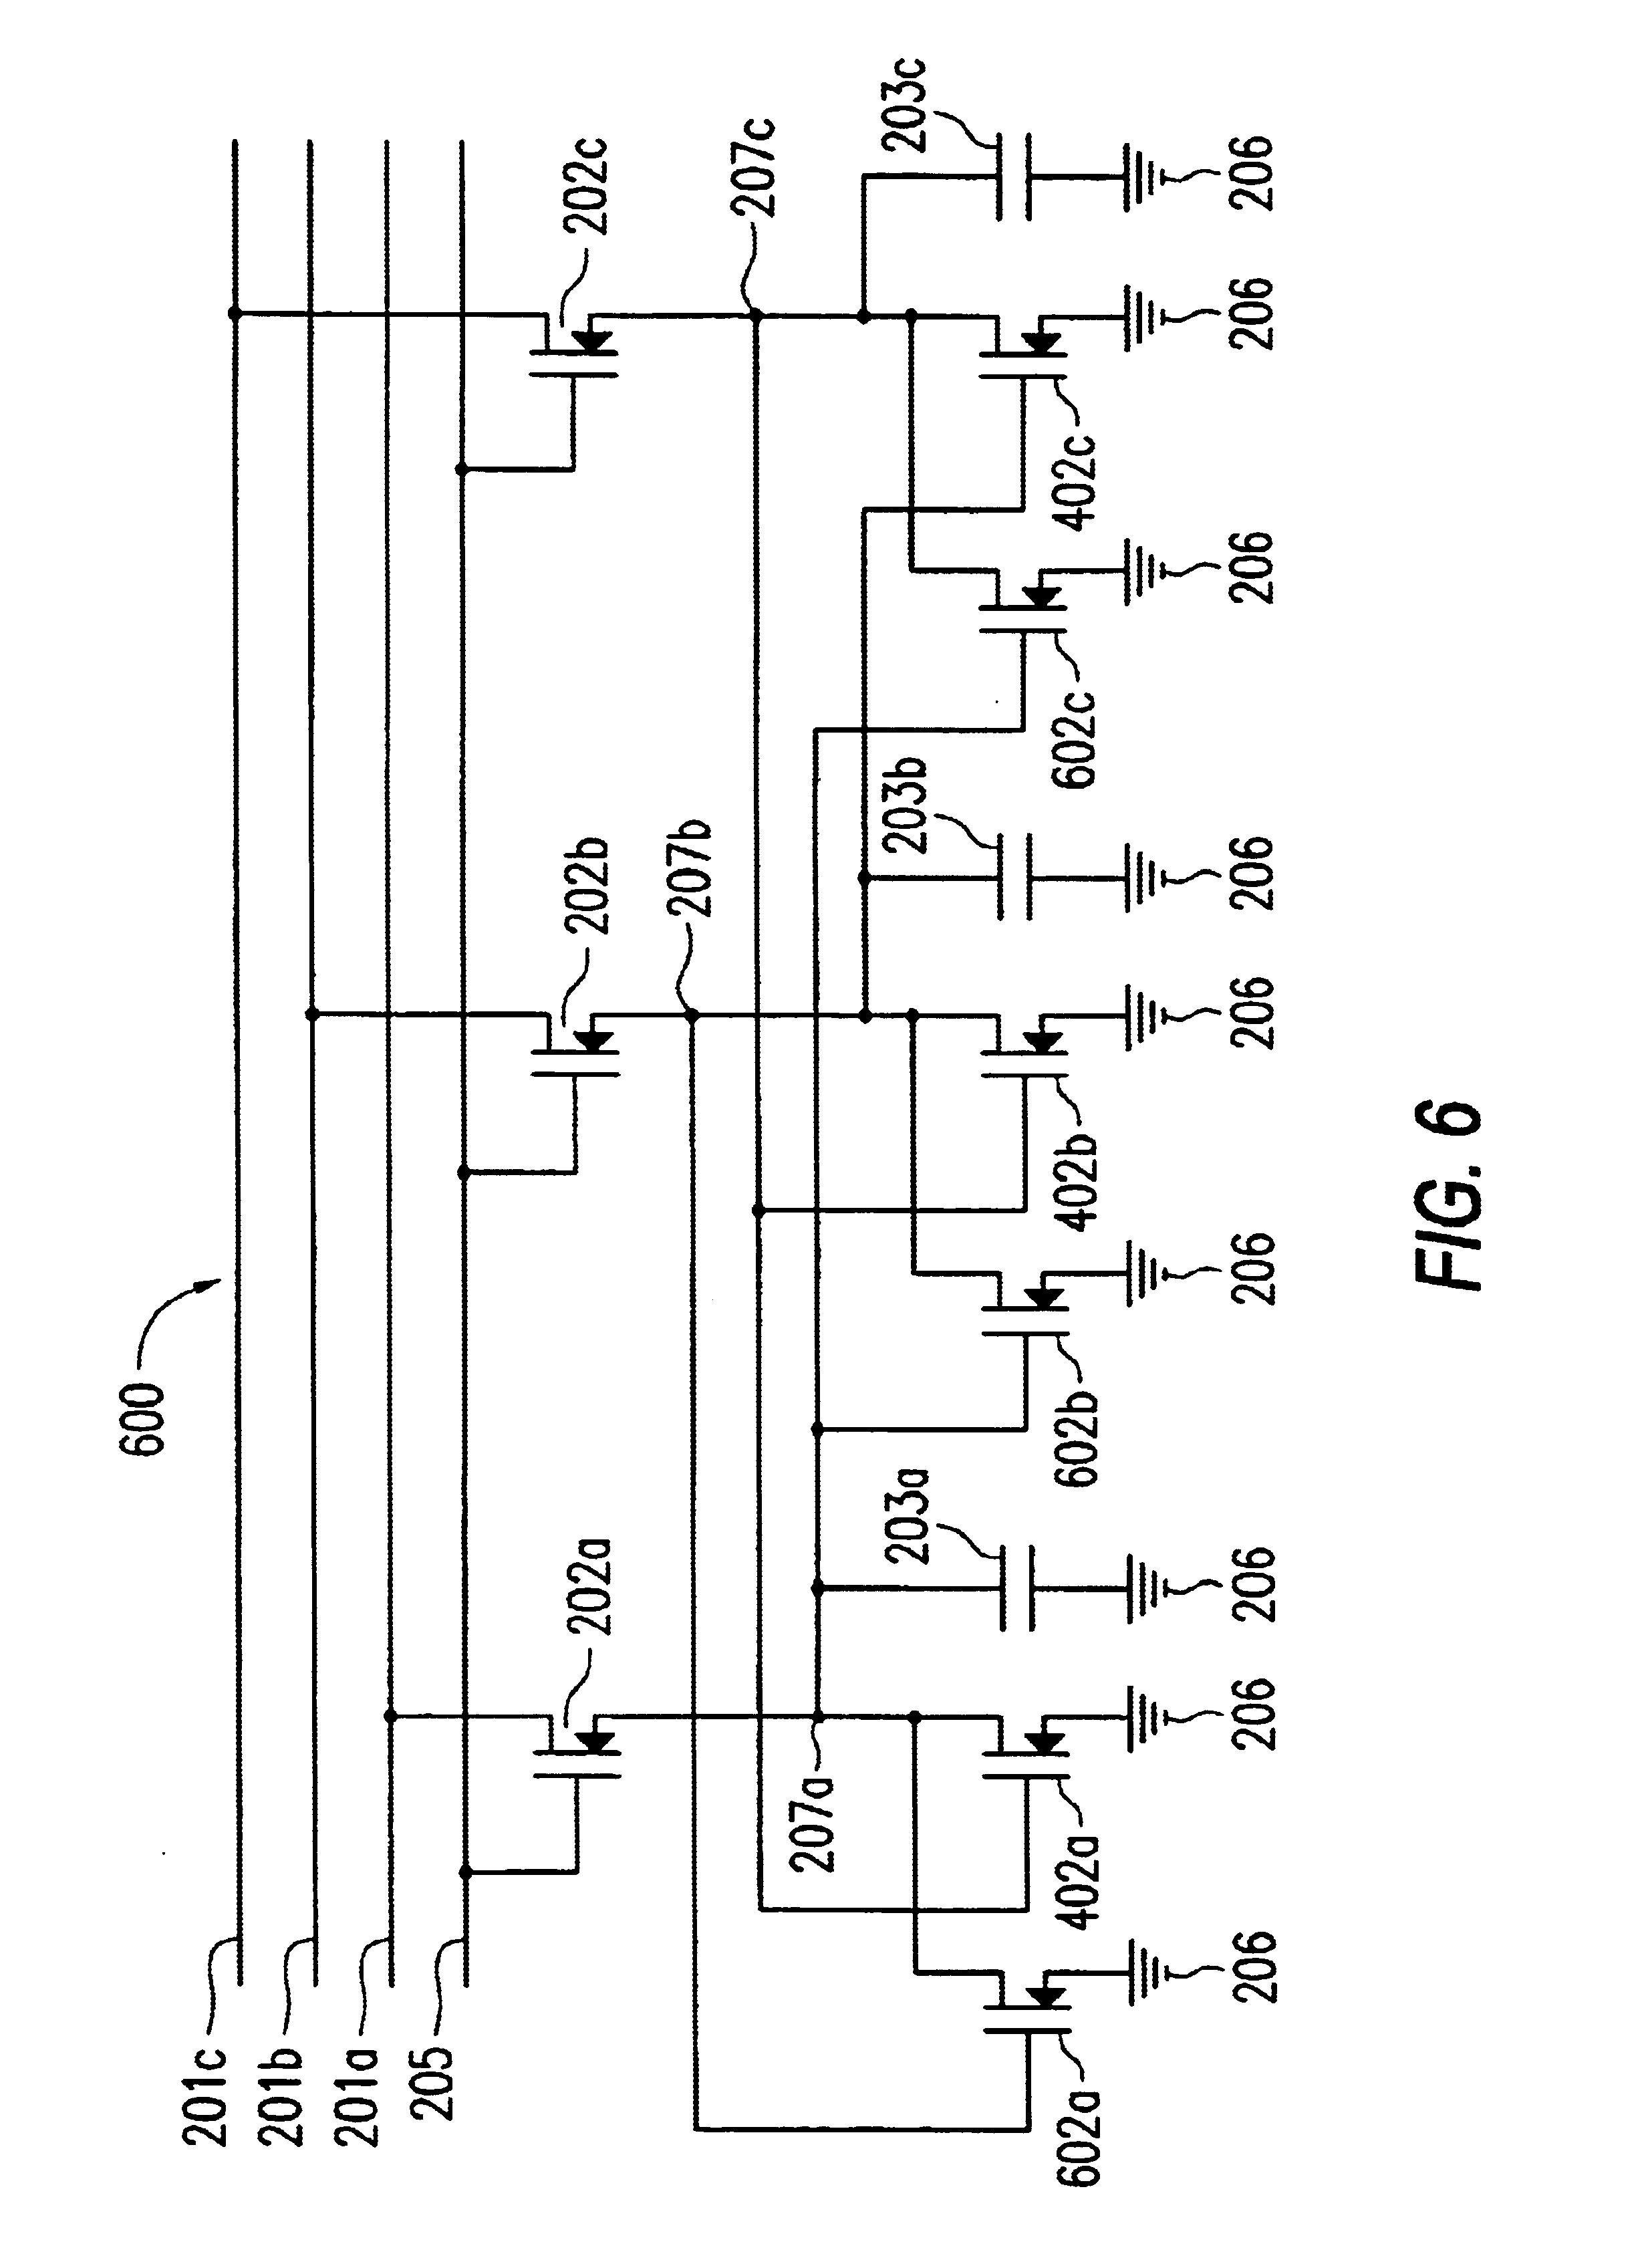 Patent Us6781856 Tertiary Cam Cell Google Patents 800 Mobile Phone Logical Circuit Principle Diagram Controlcircuit Drawing